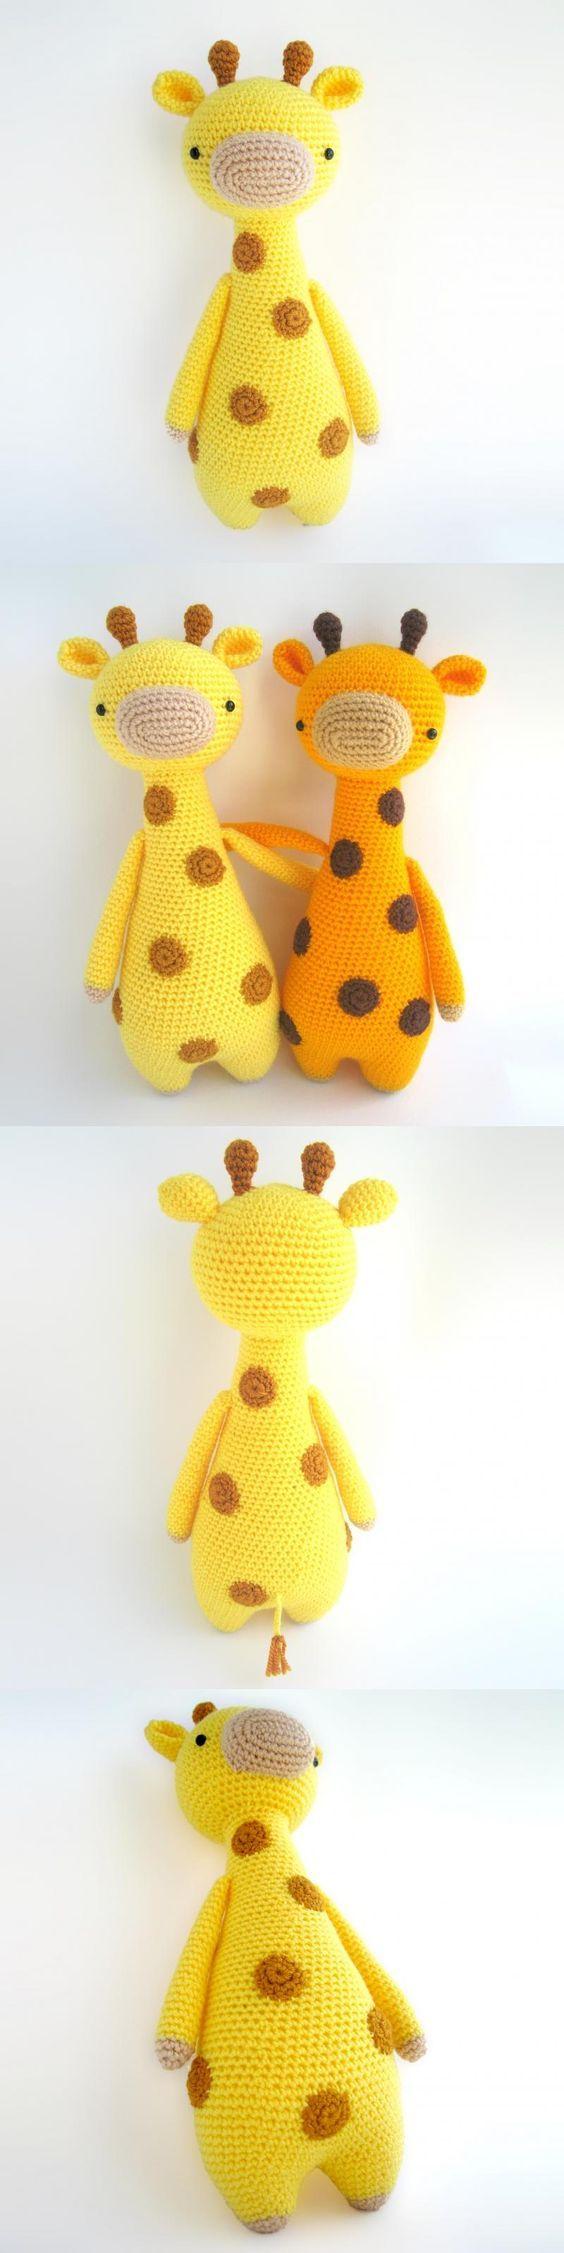 Tutorial Giraffe Amigurumi : Best 20+ Crochet Giraffe Pattern ideas on Pinterest ...